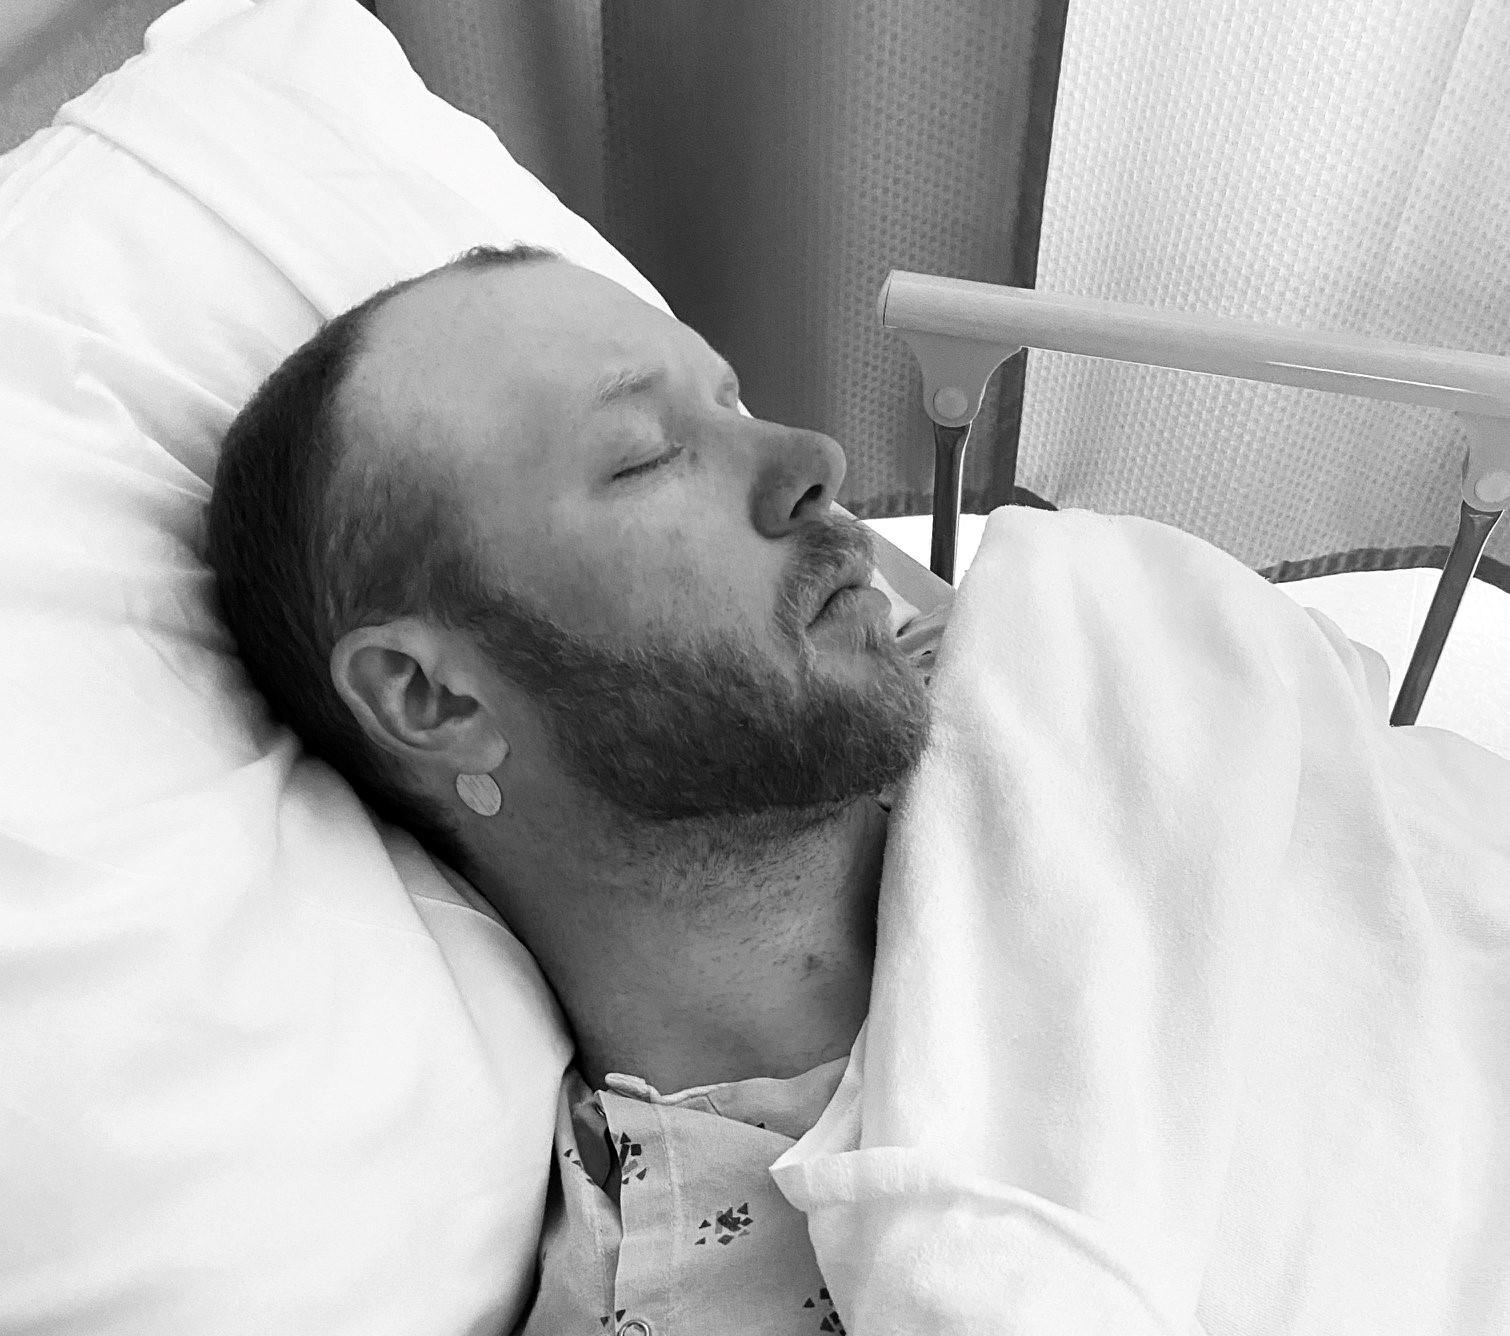 Man in hospital bed sleeping